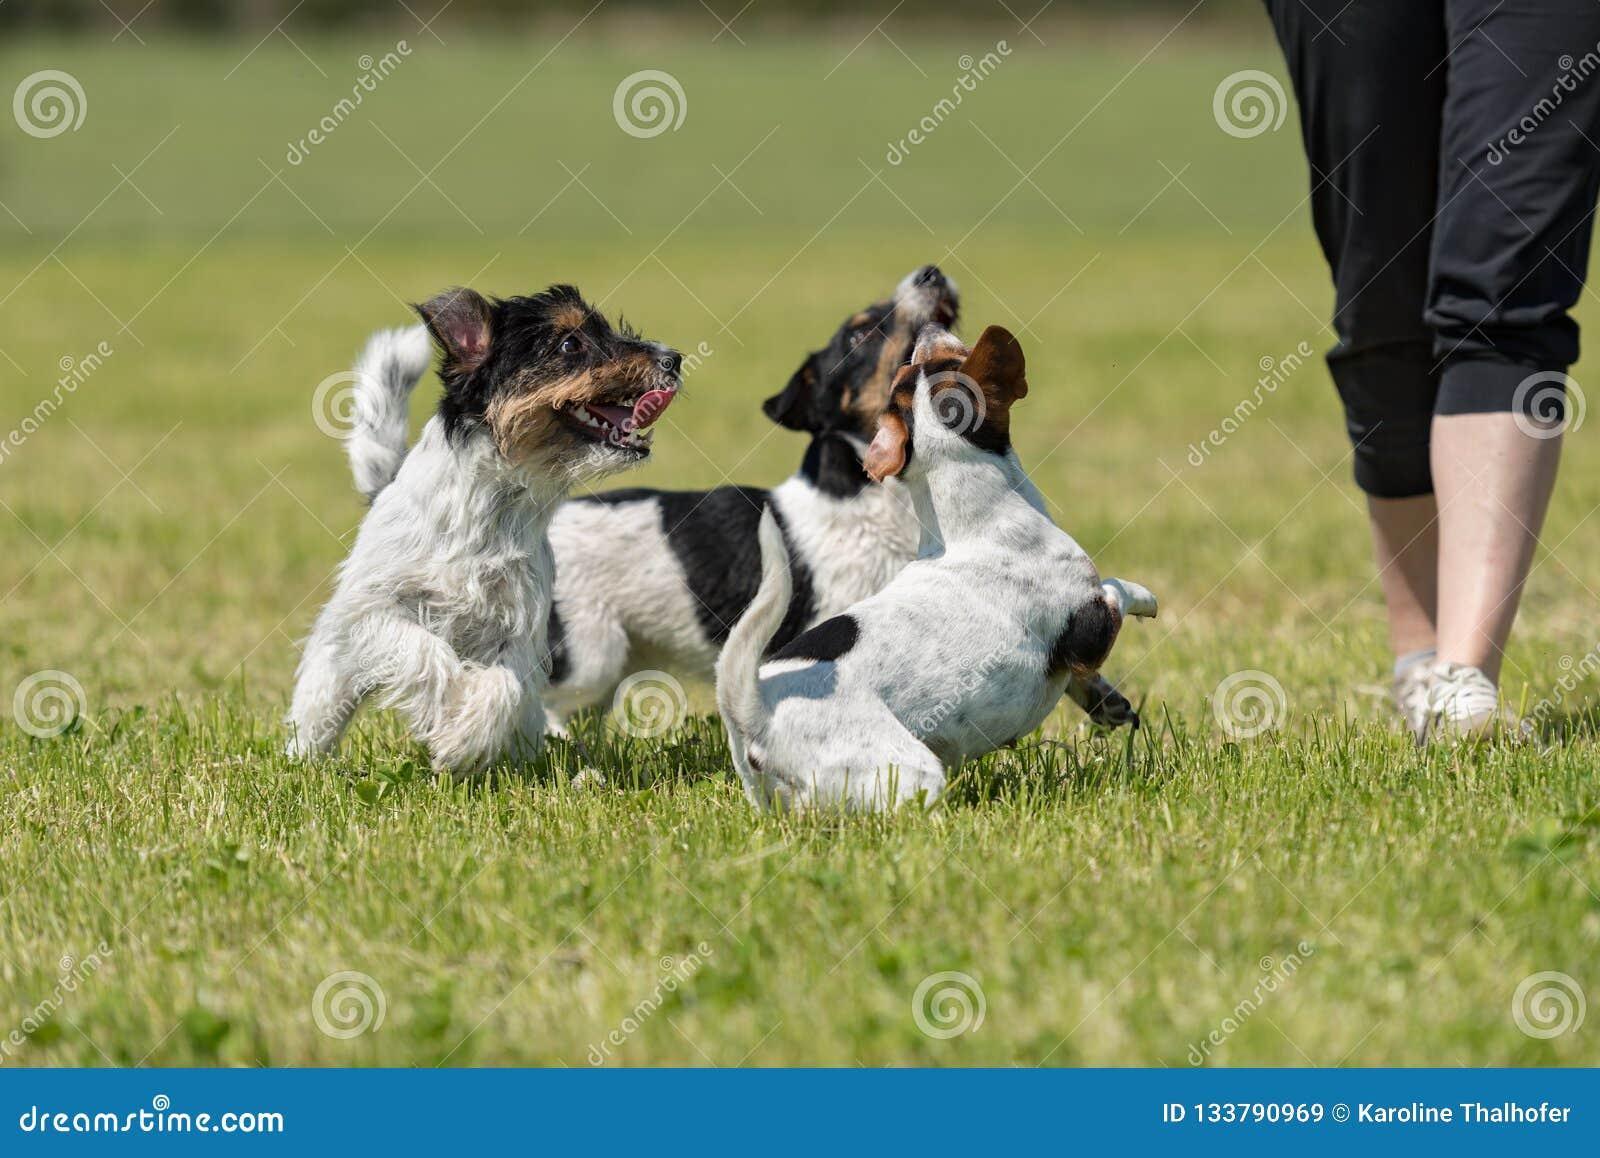 Прогулка и игра владельца с много собак на луге